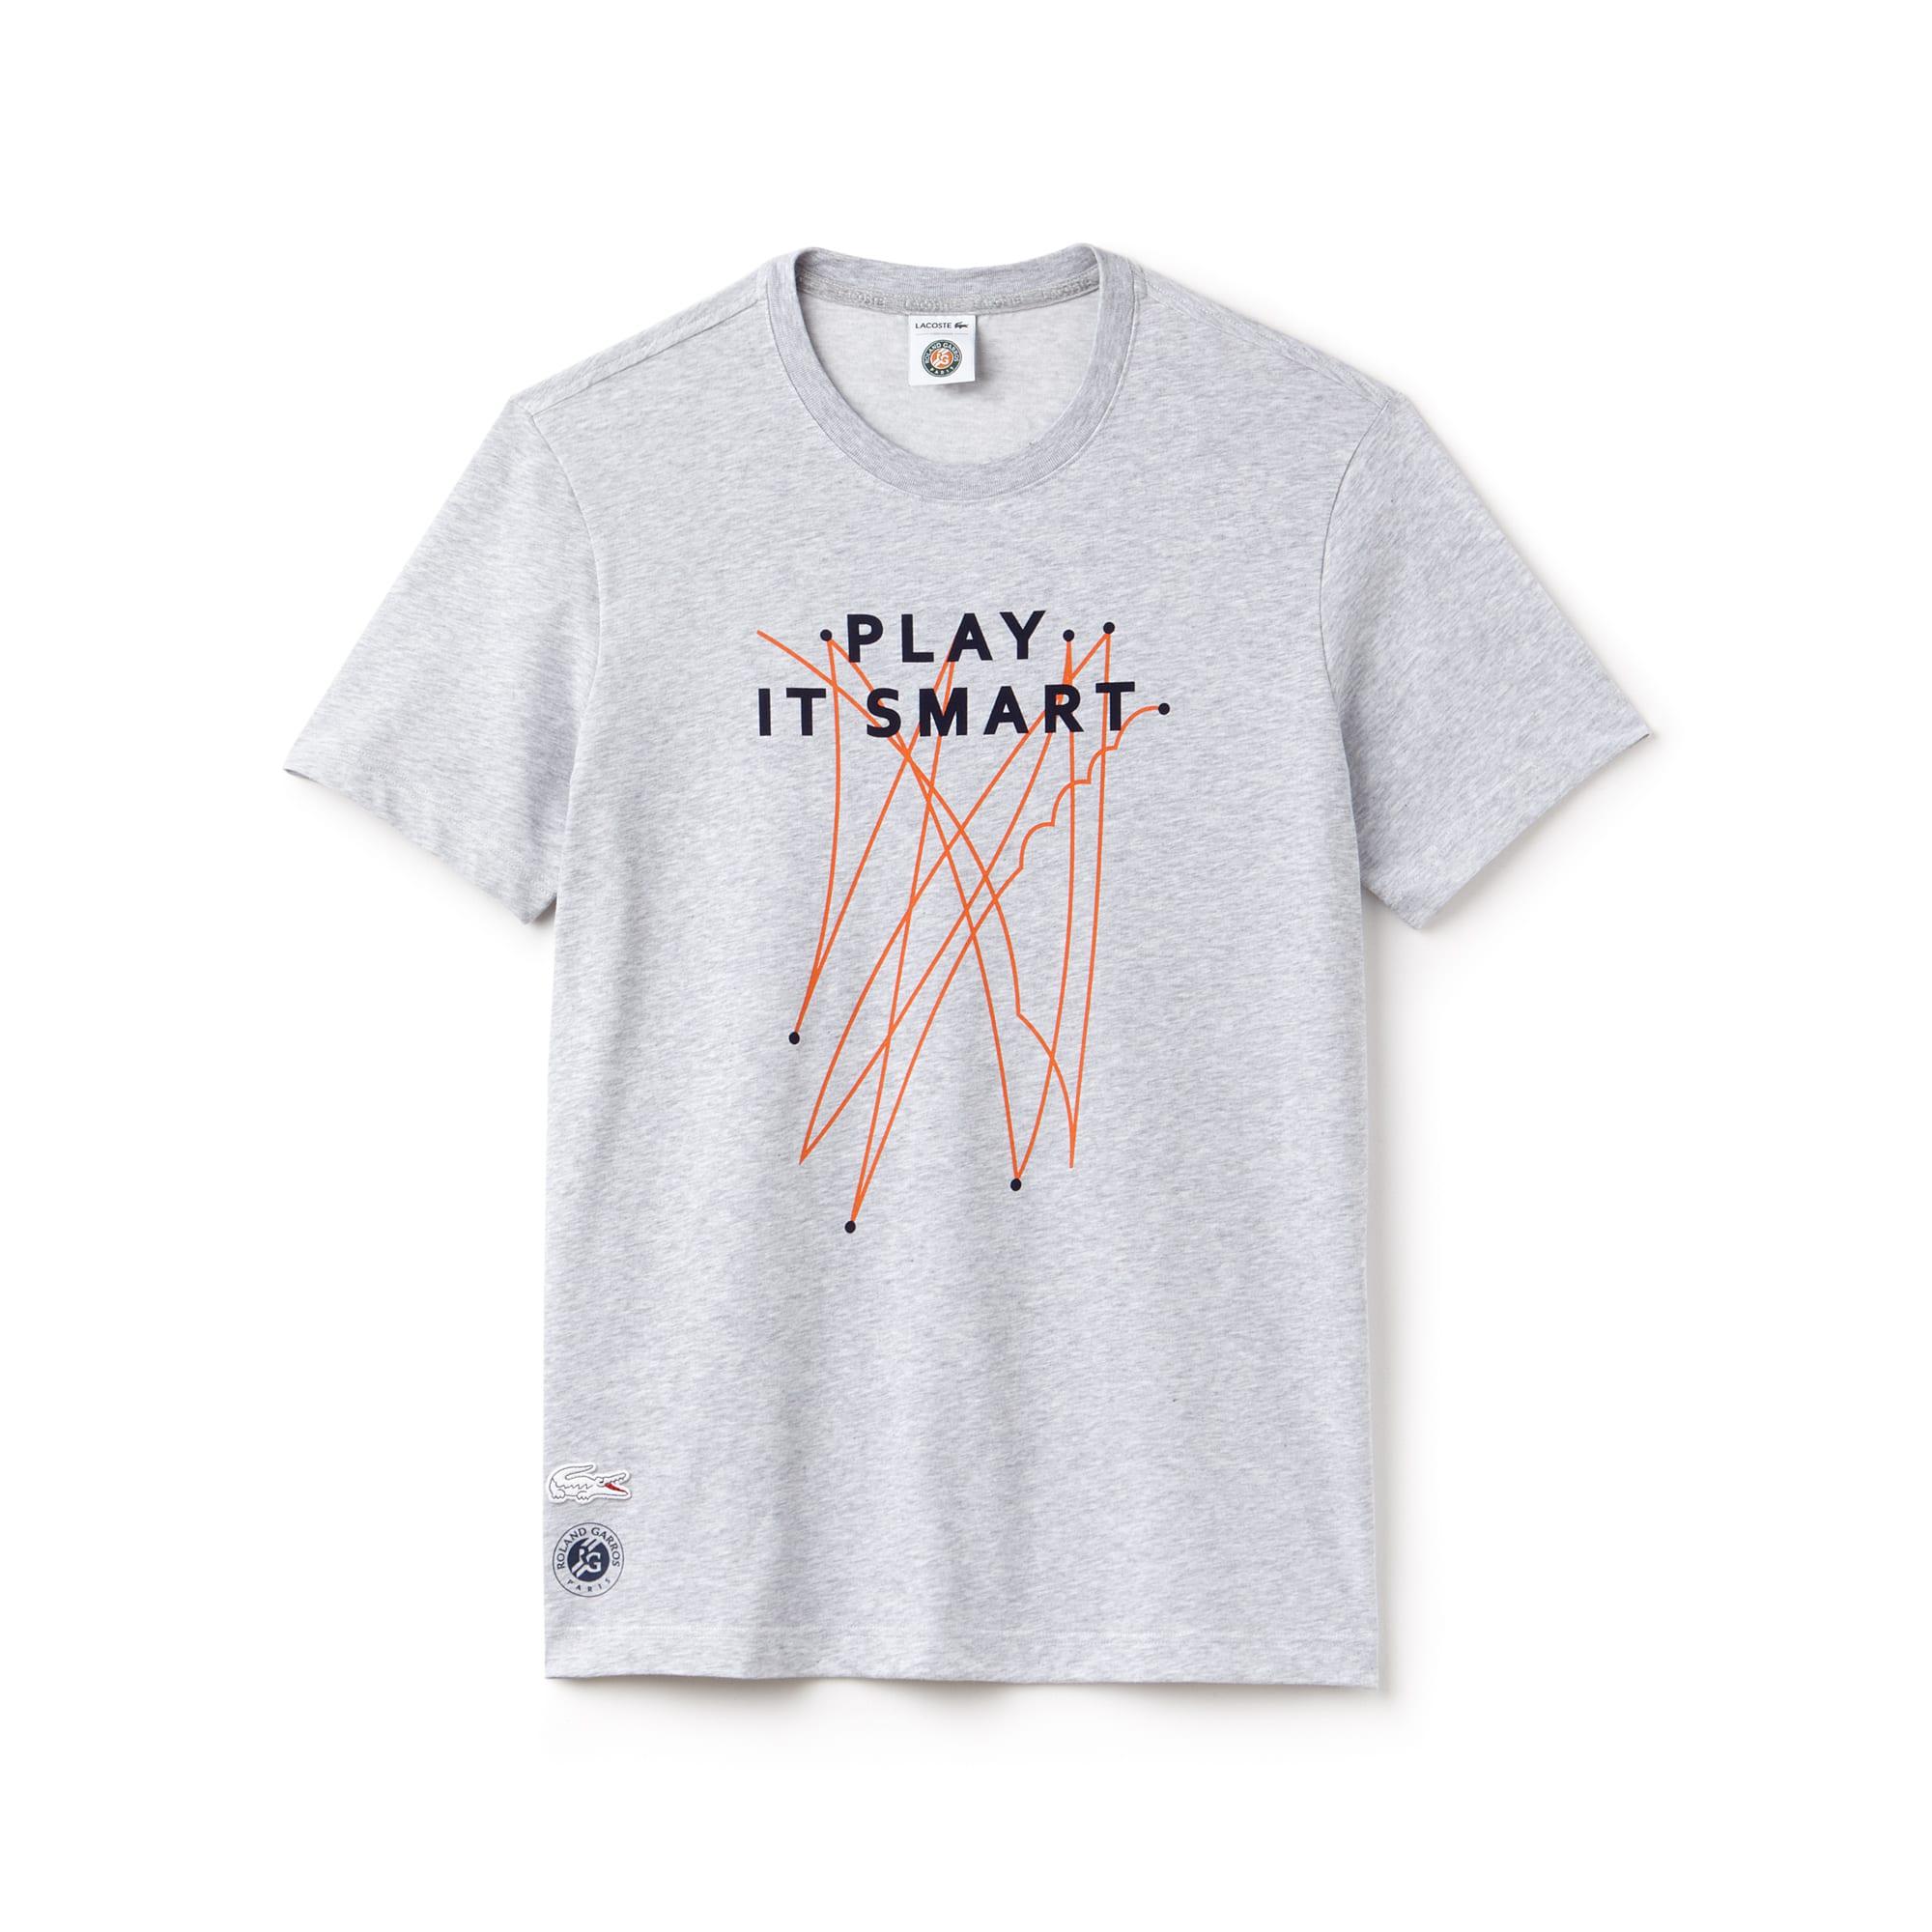 Camiseta Lacoste SPORT de punto jersey técnico Edición Roland Garros